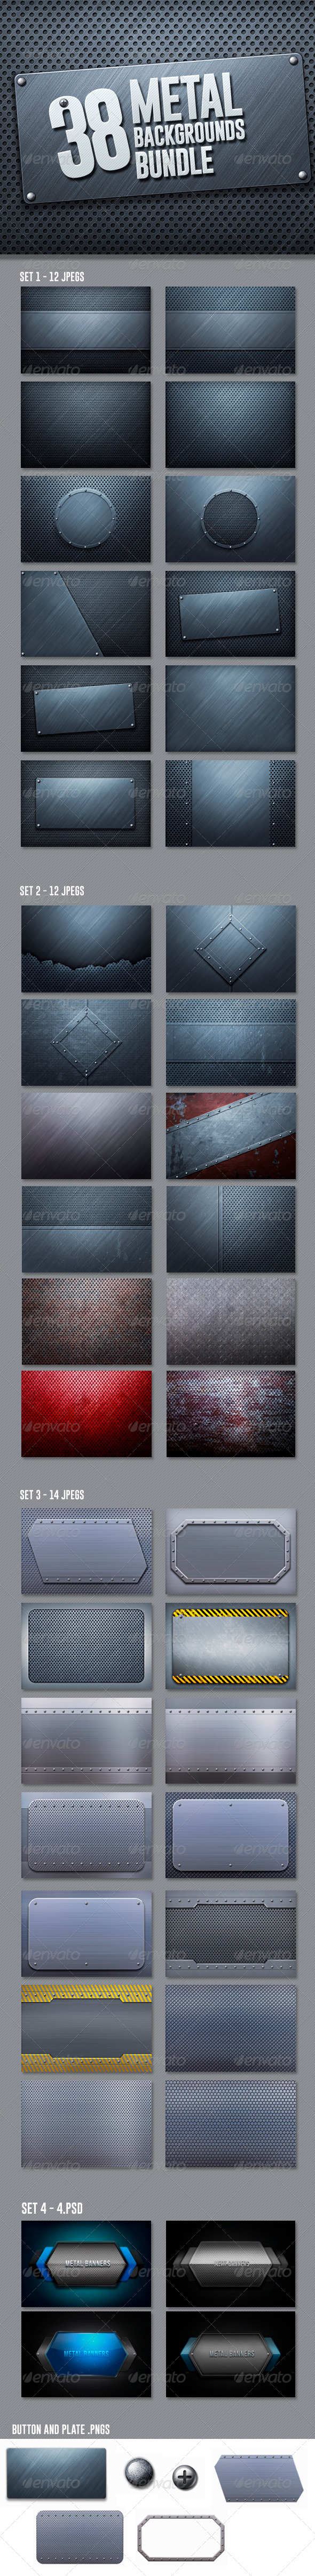 42 Metal Backgrounds Bundle - Urban Backgrounds